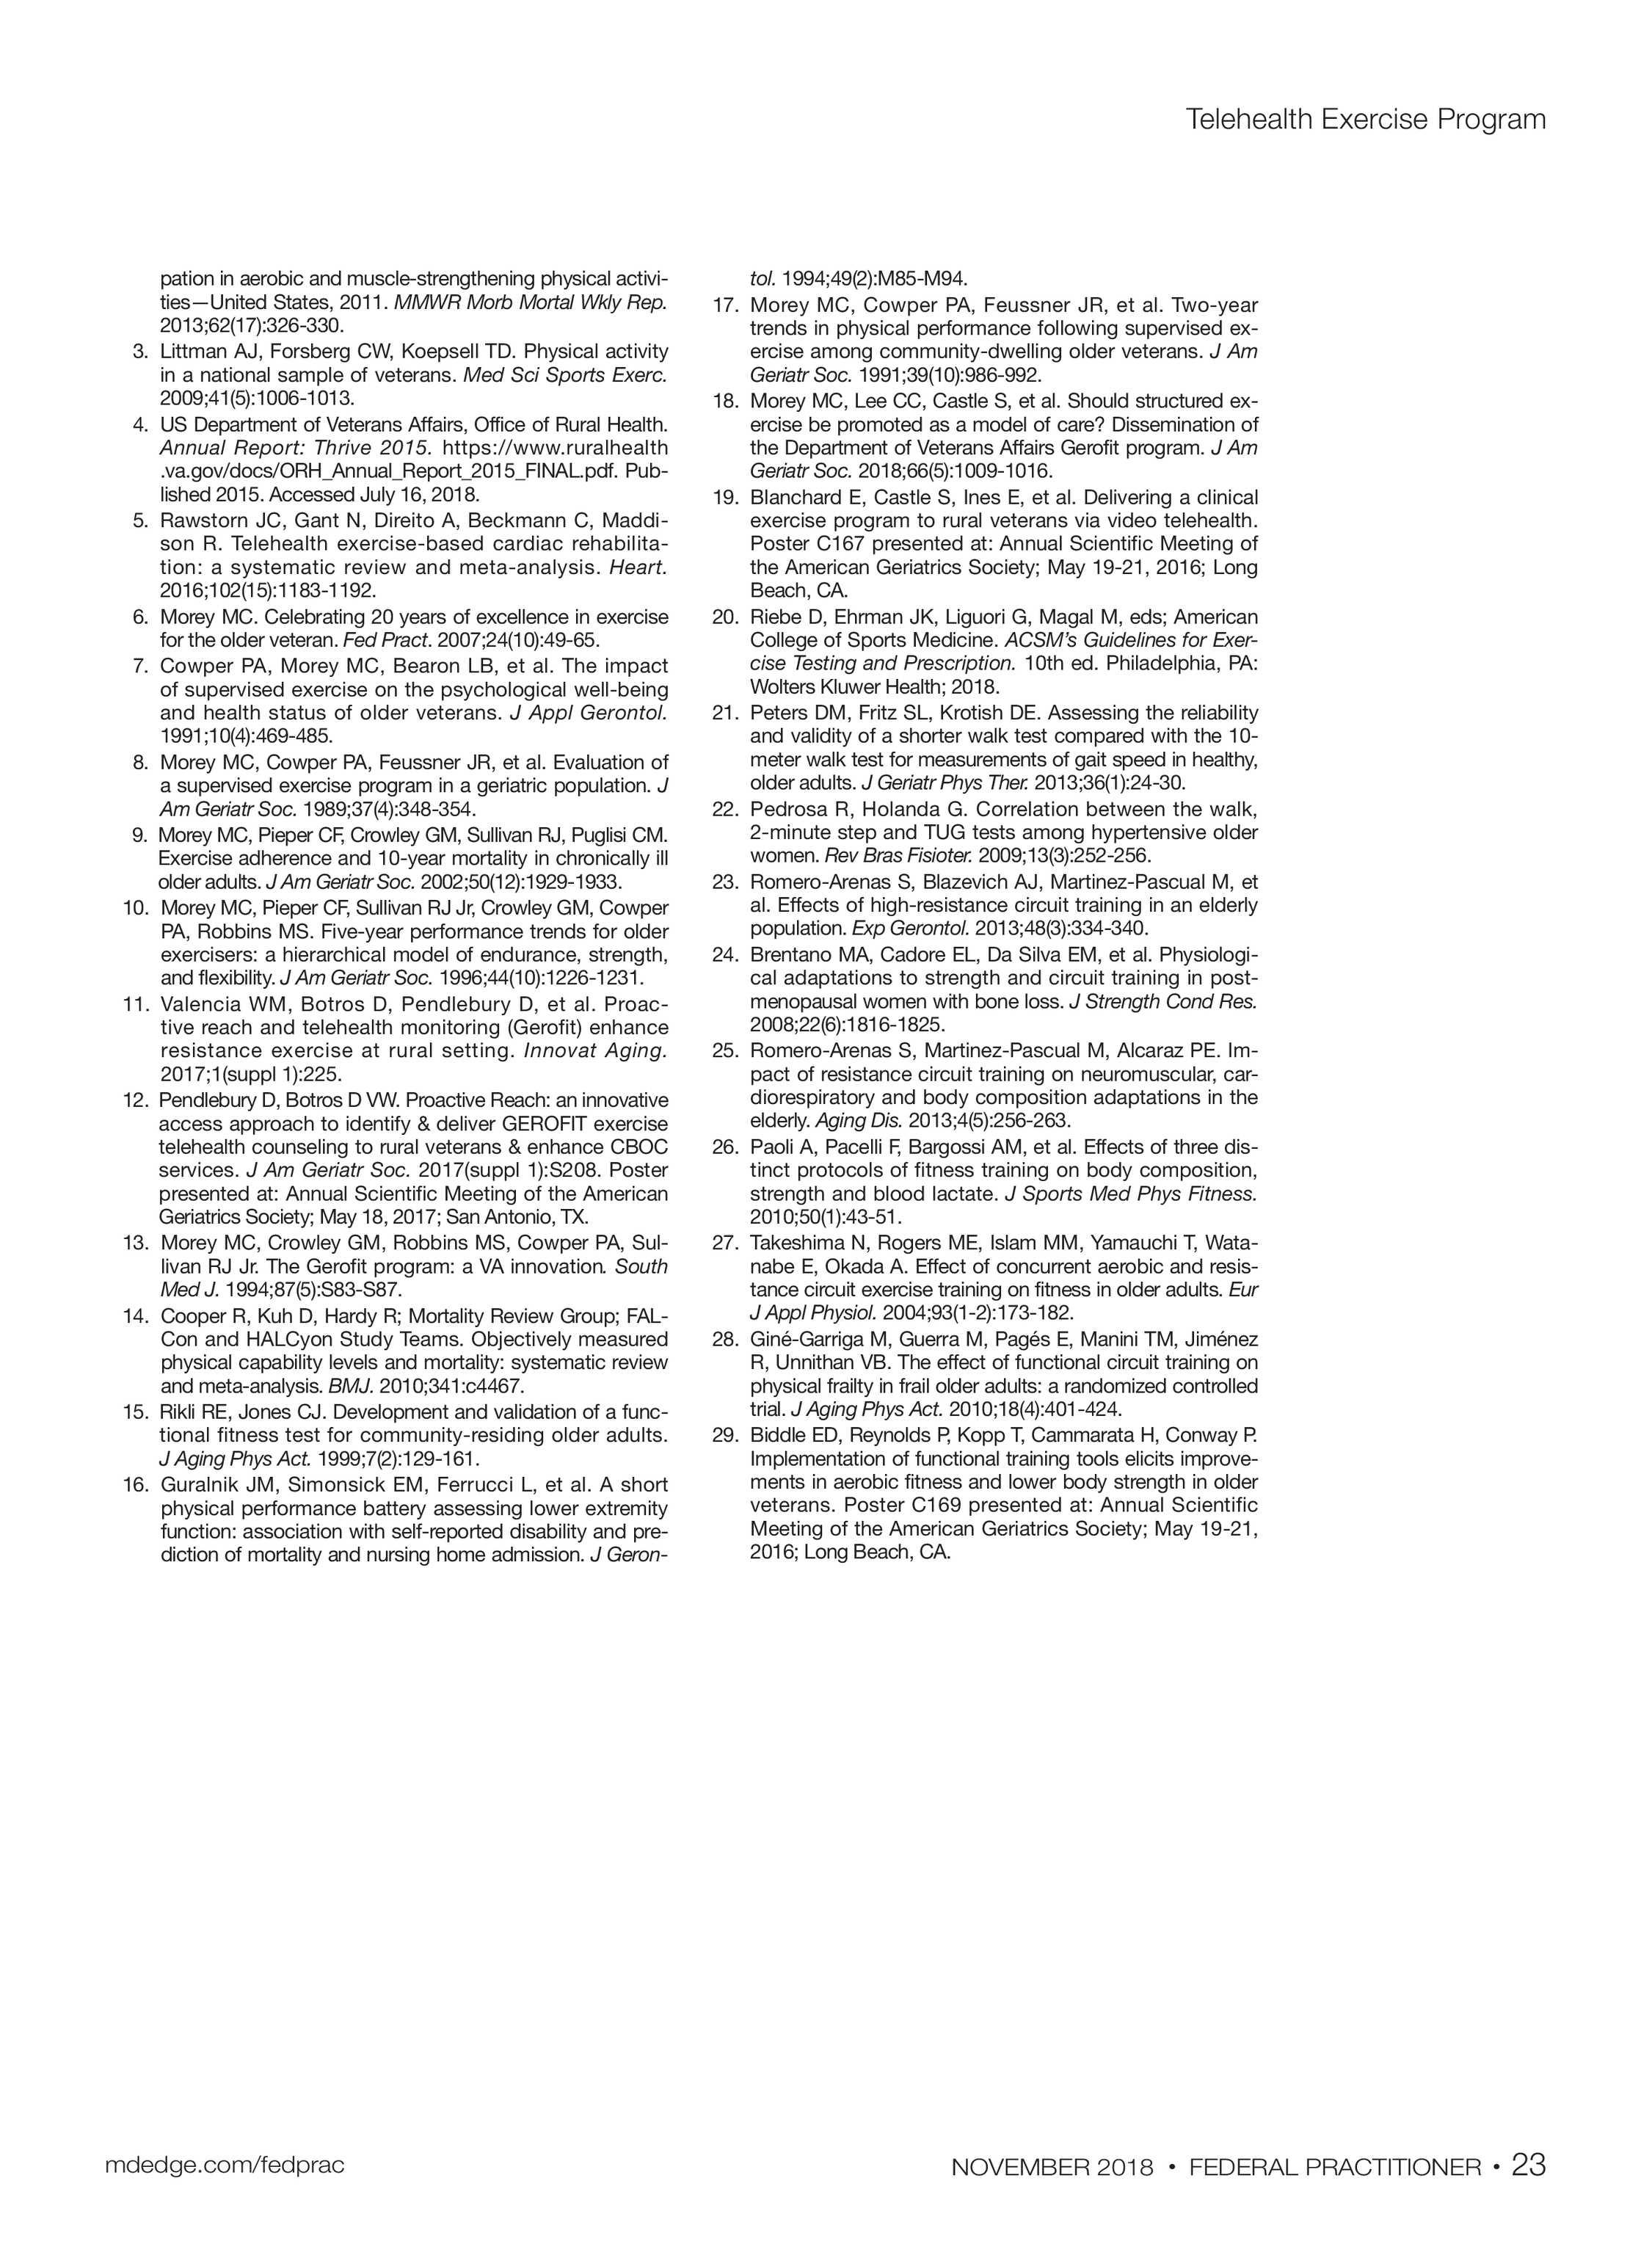 Federal Practitioner - November2018 - page 30